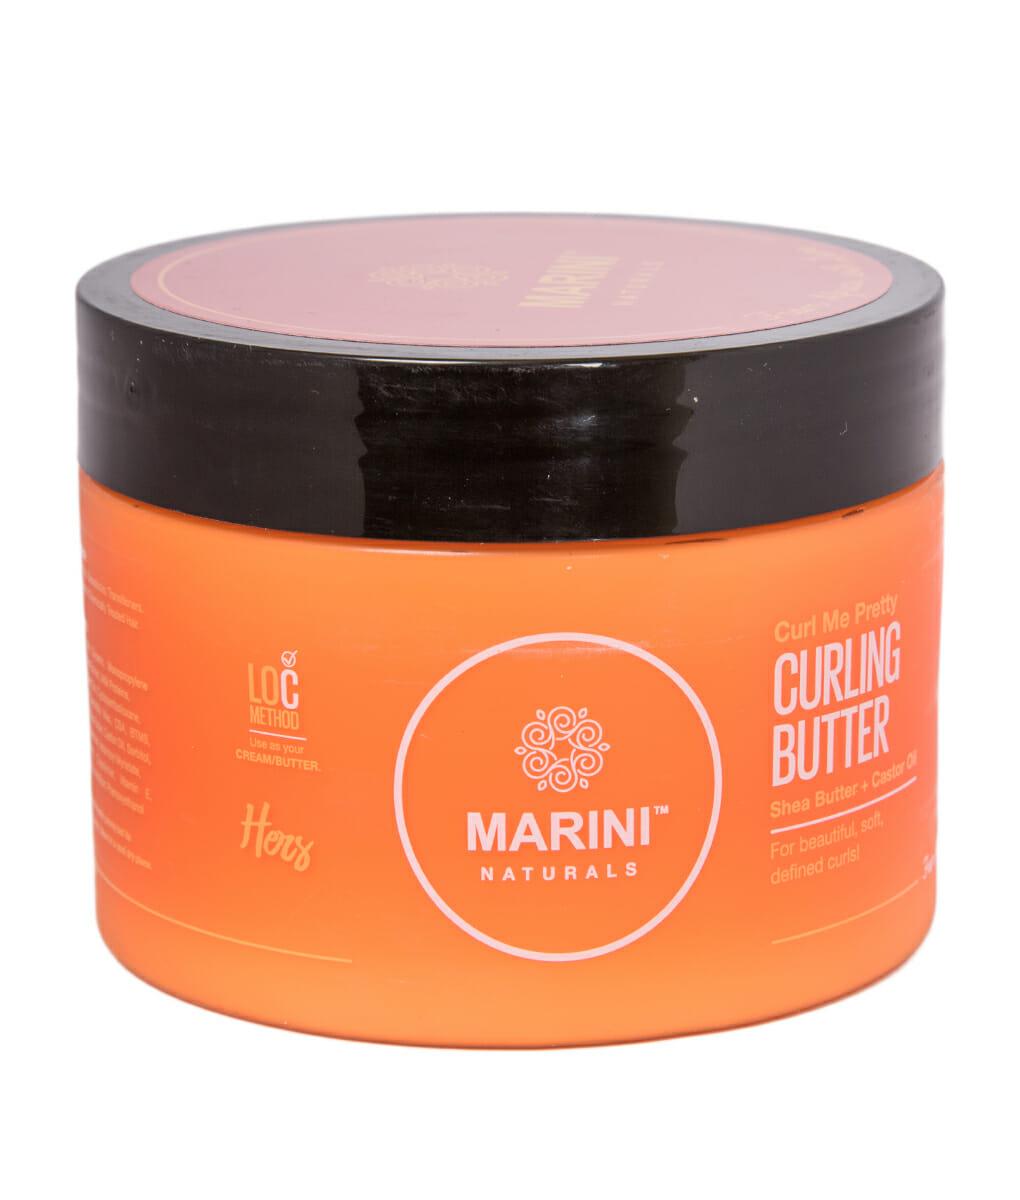 "Marini Naturals ""Curl Me Pretty"" Curling Butter 20g   Kasha ..."